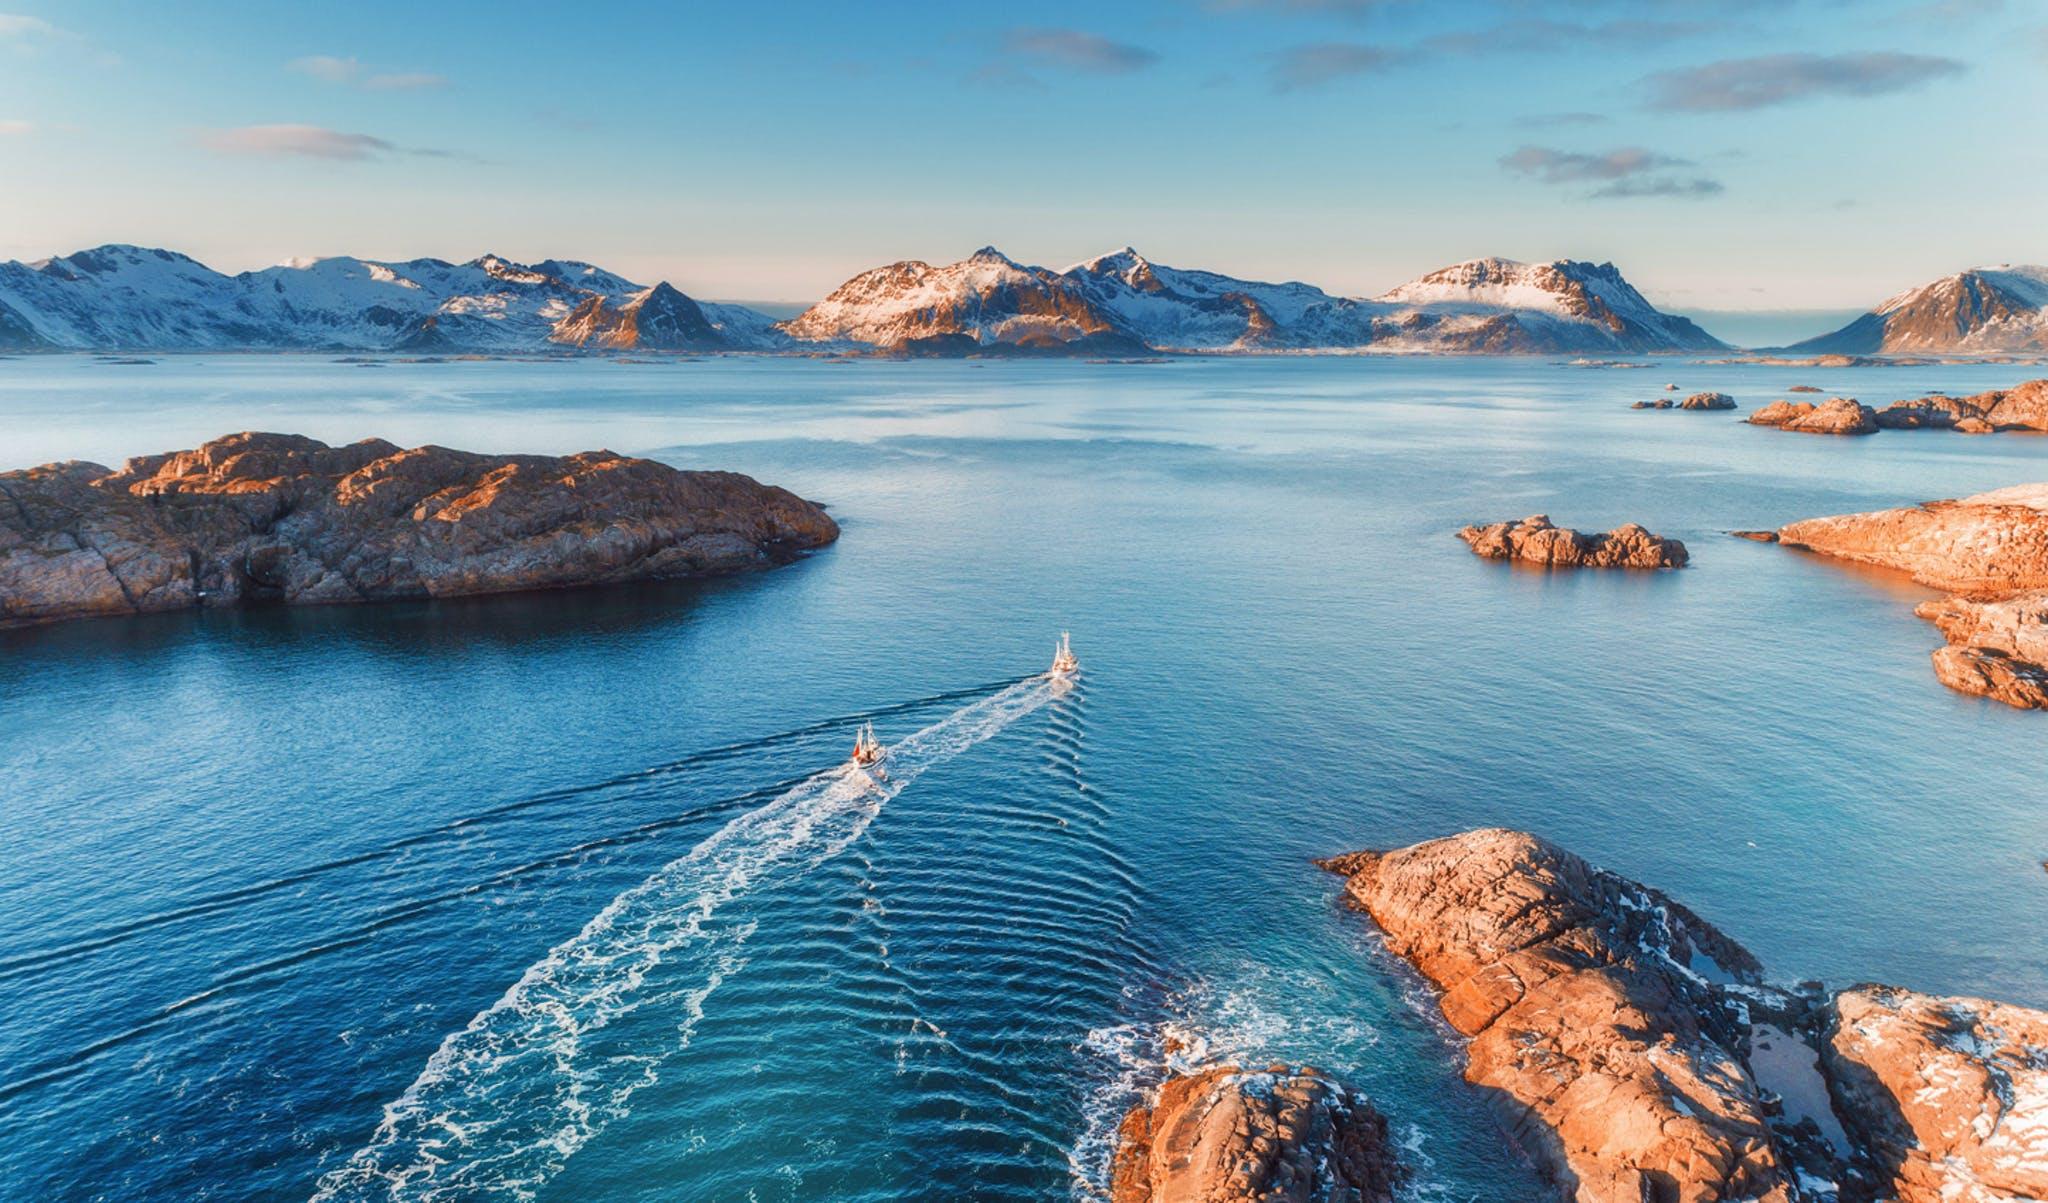 Sailing in the Lofoten Islands